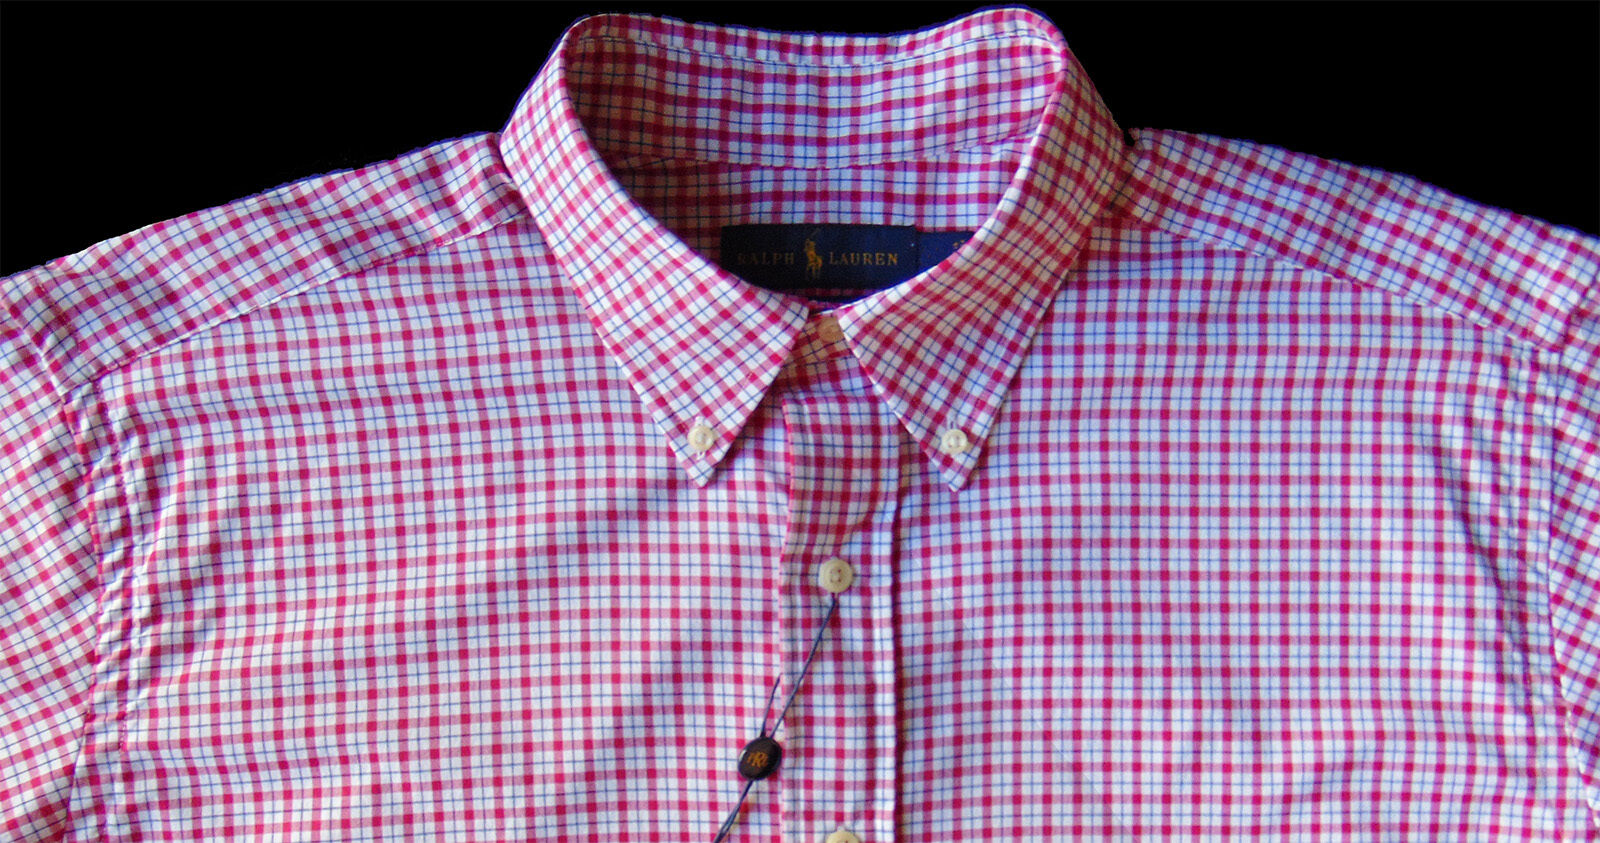 Men's RALPH LAUREN Red White Plaid Shirt LT TALL Performance Fabric NWT NEW